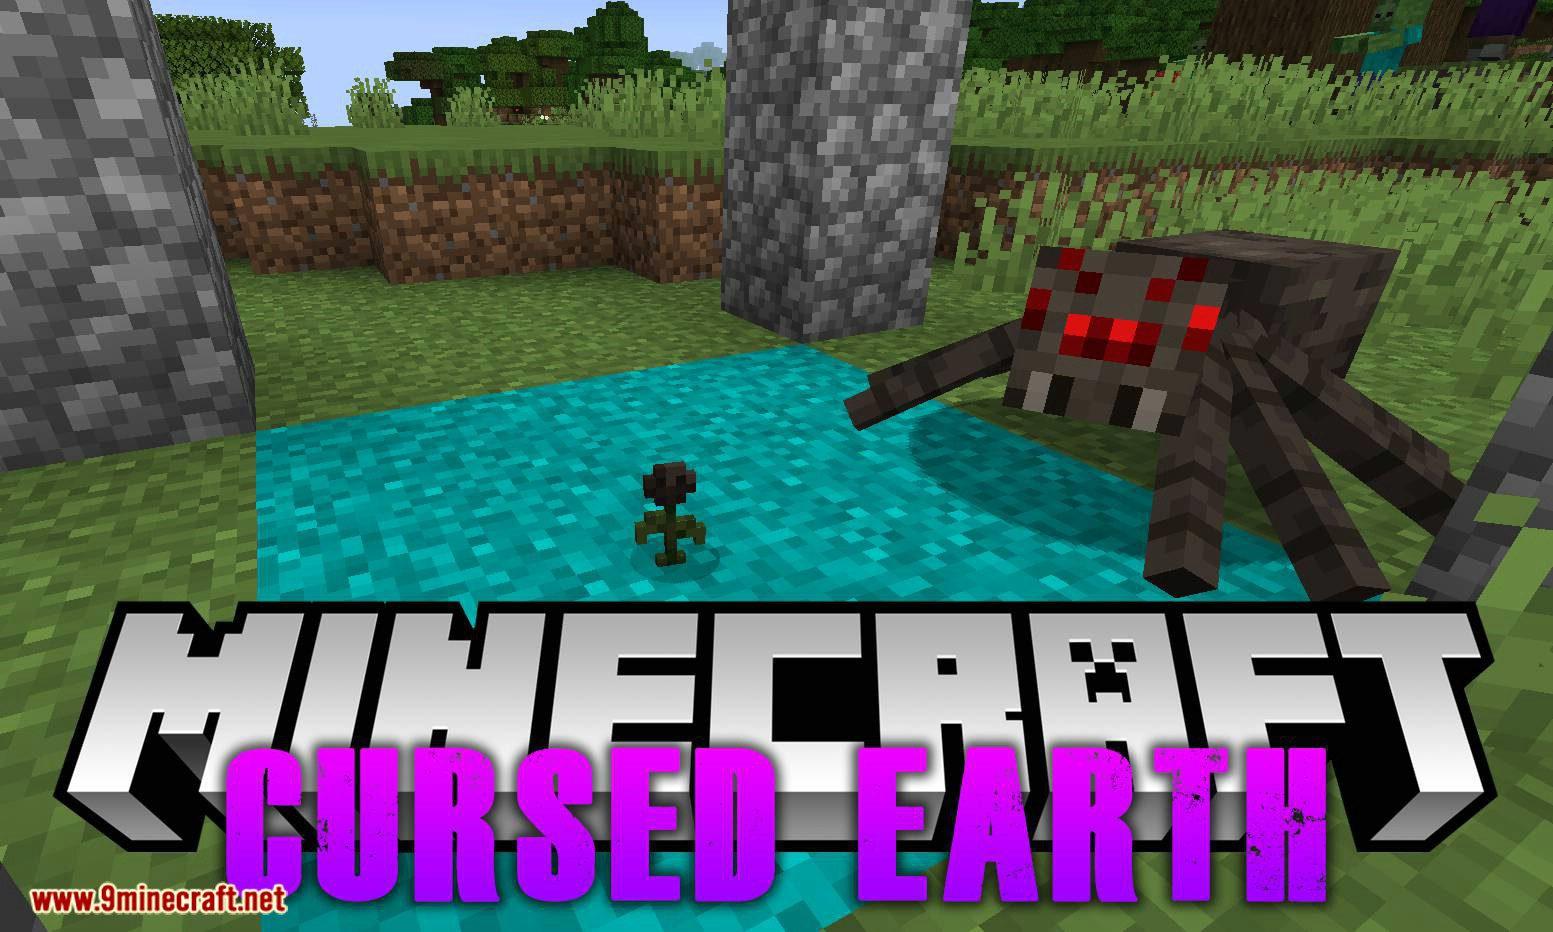 Cursed Earth mod for minecraft logo